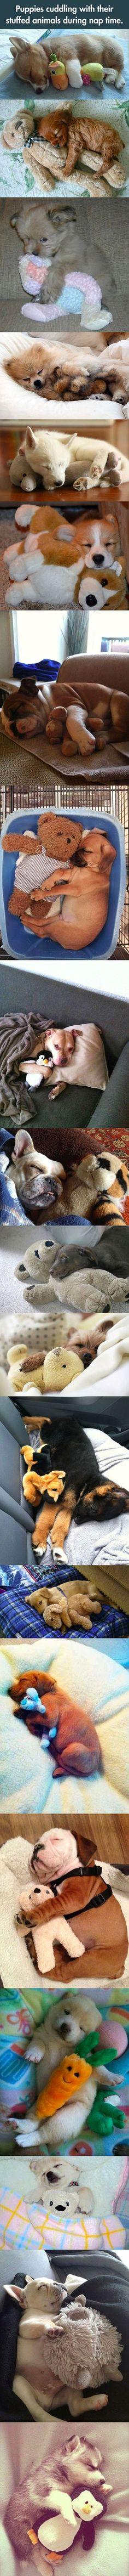 Sleeping and cuddling.